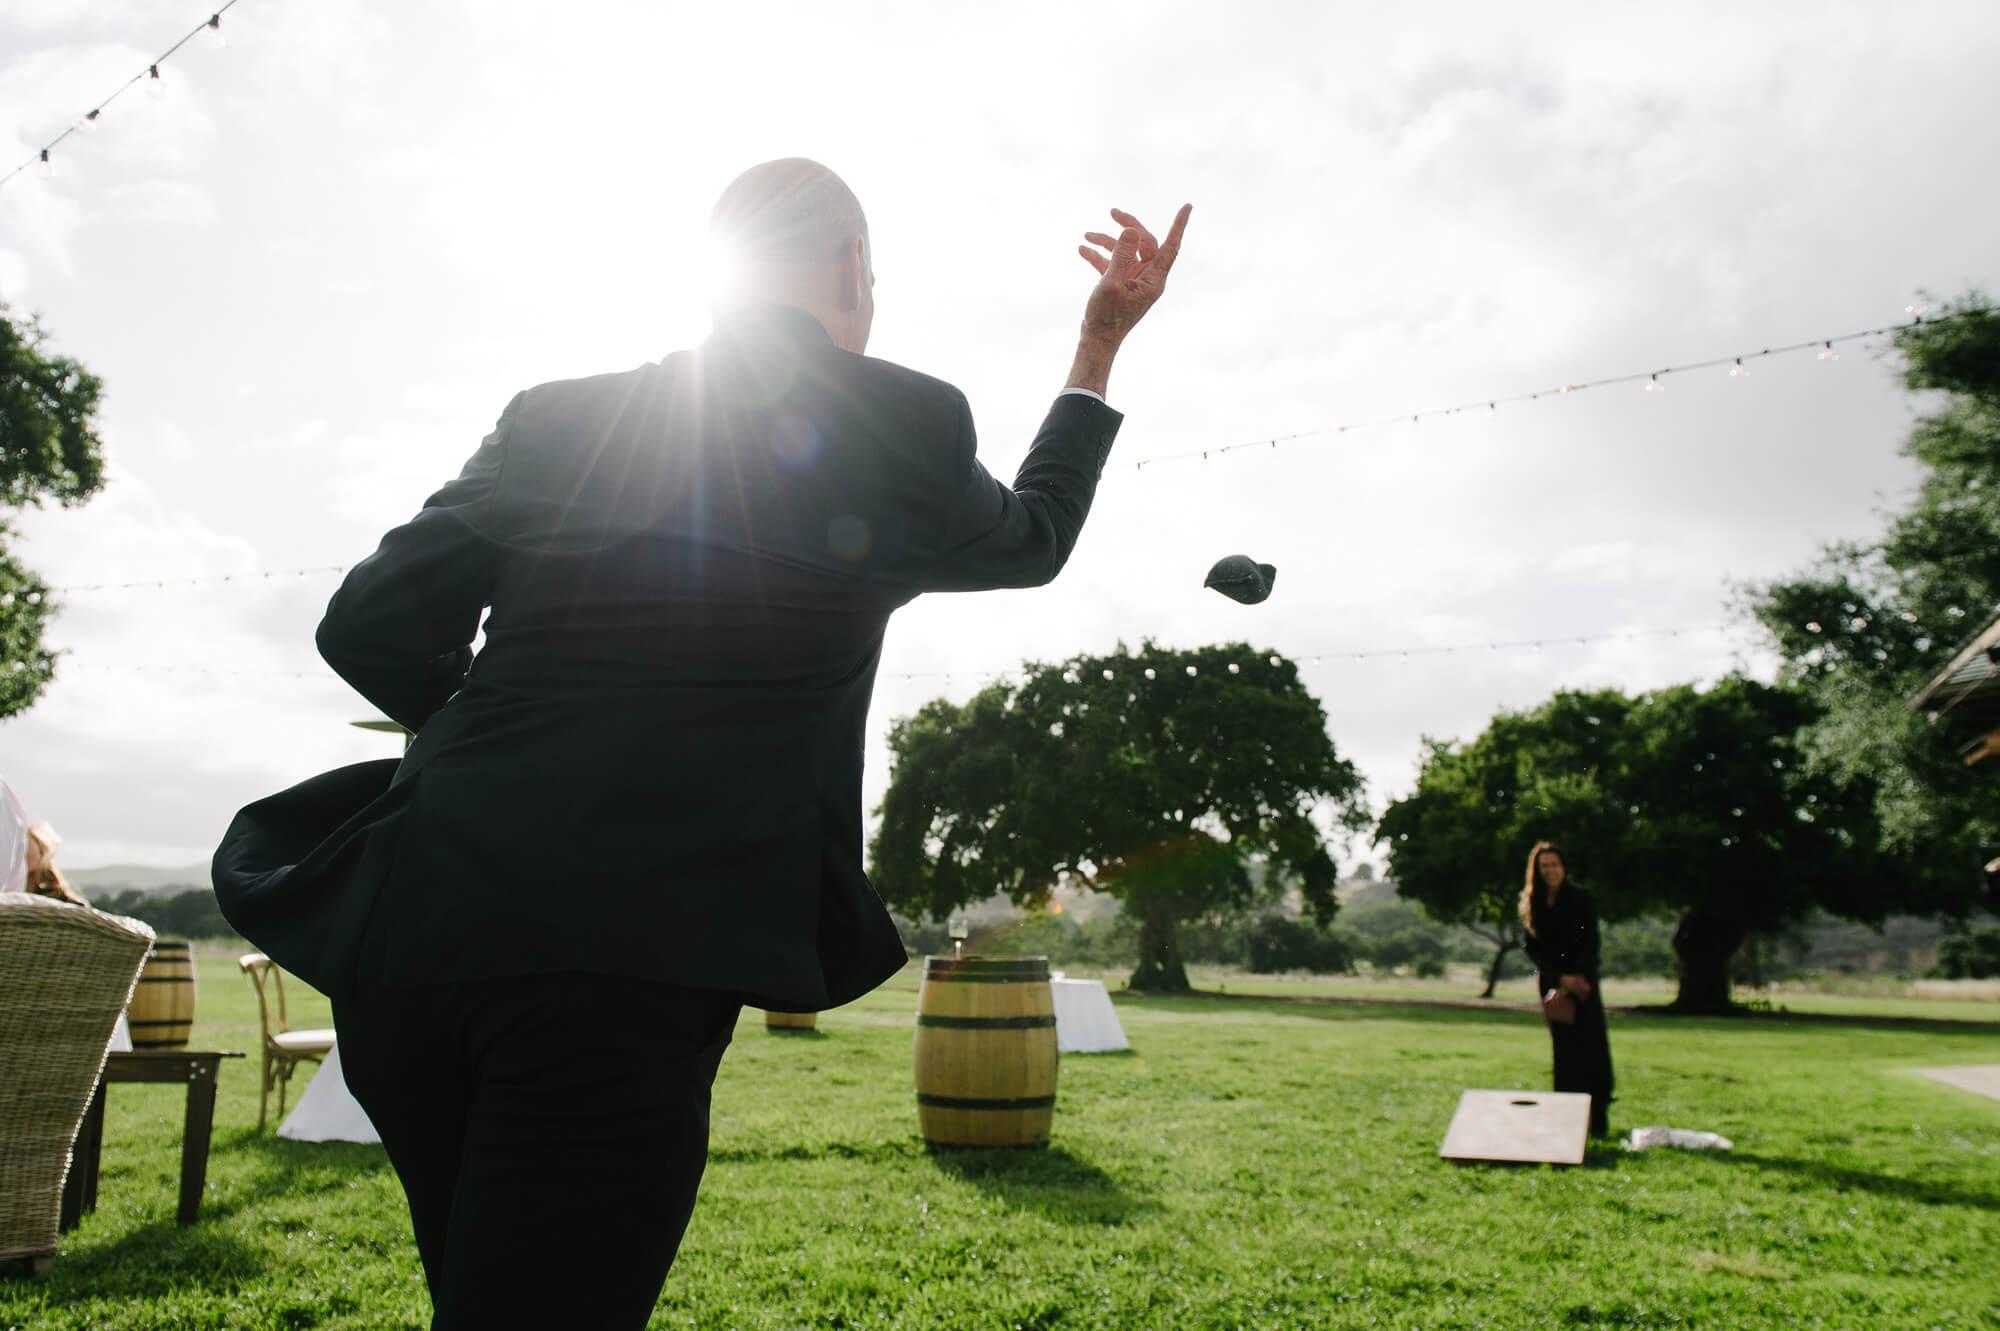 los-olivos-firestone-winery-destination-wedding-central-coast-wedding-photographer-23.jpg